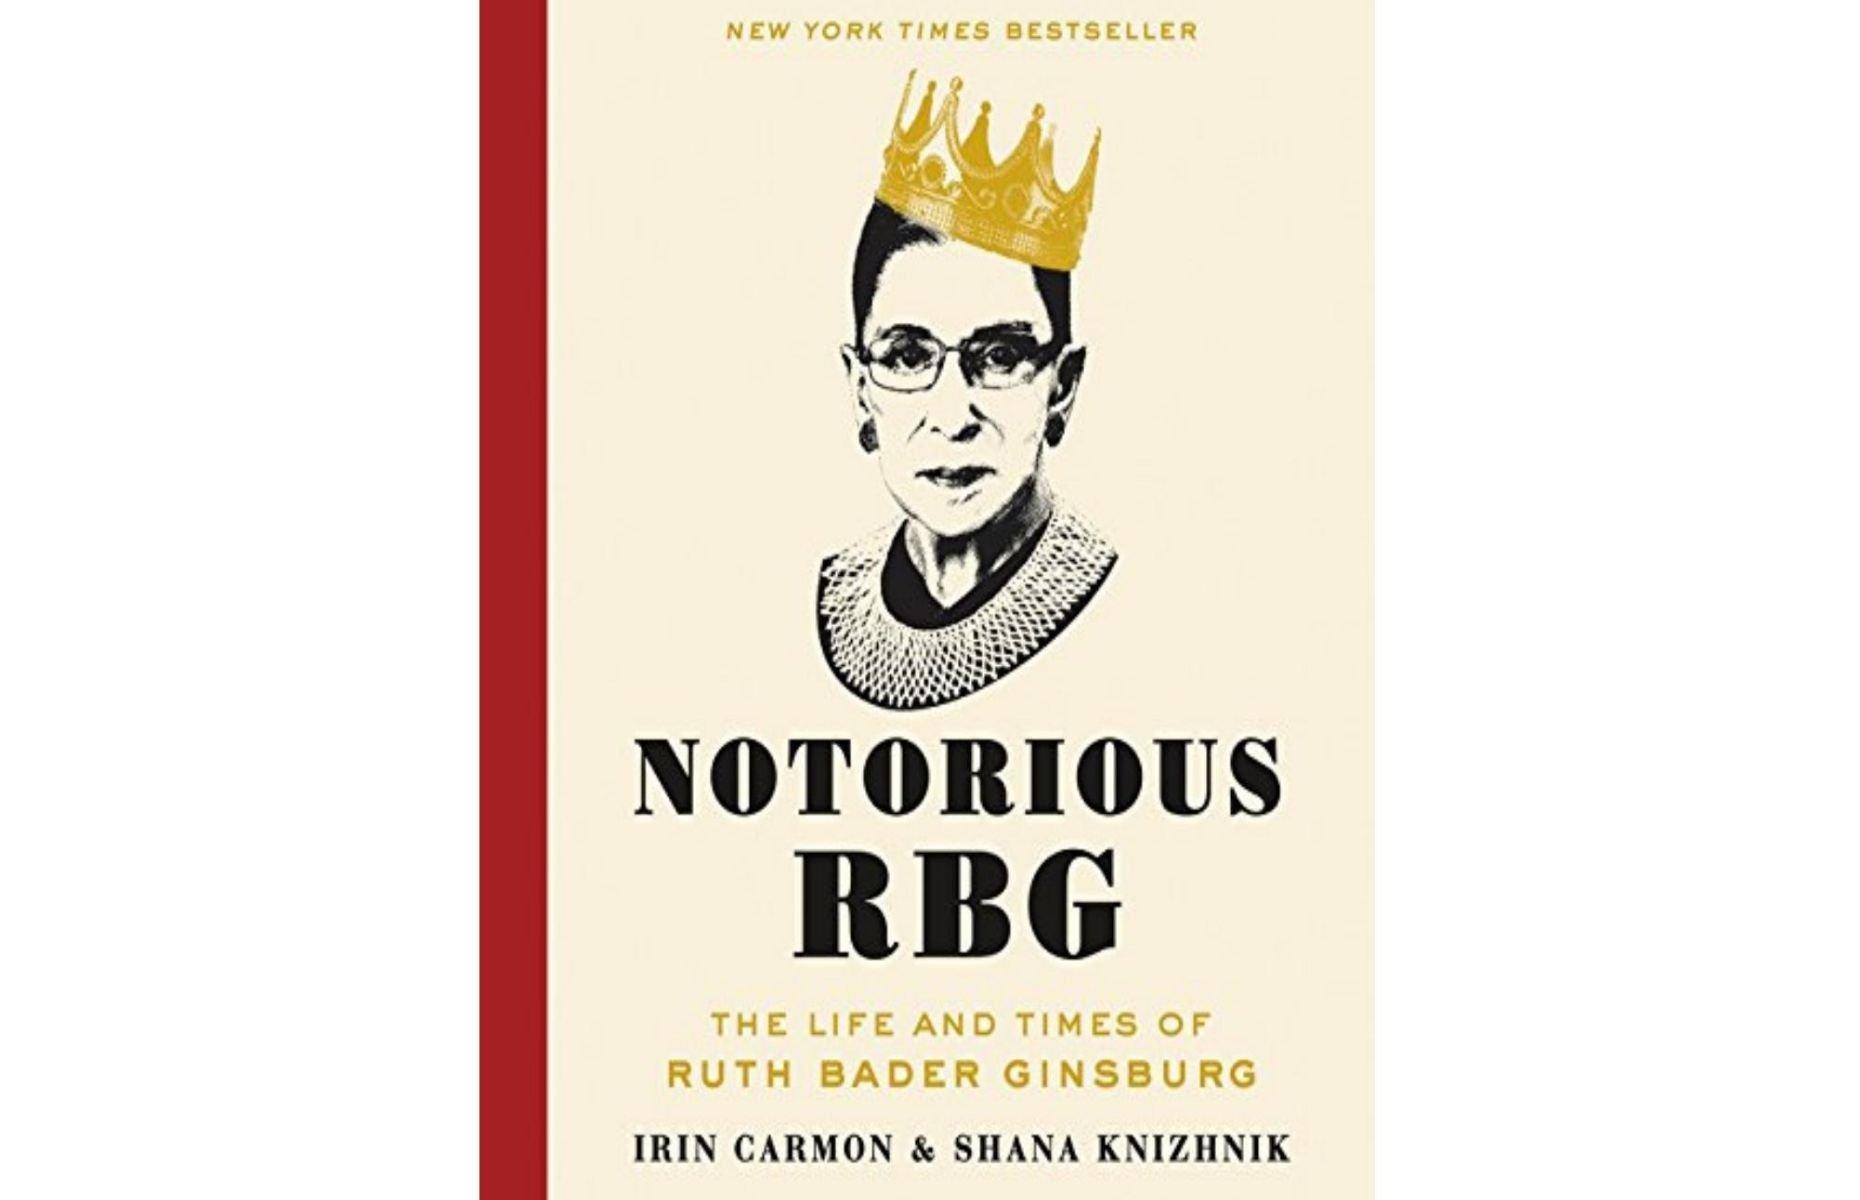 #10 Notorious-RBG